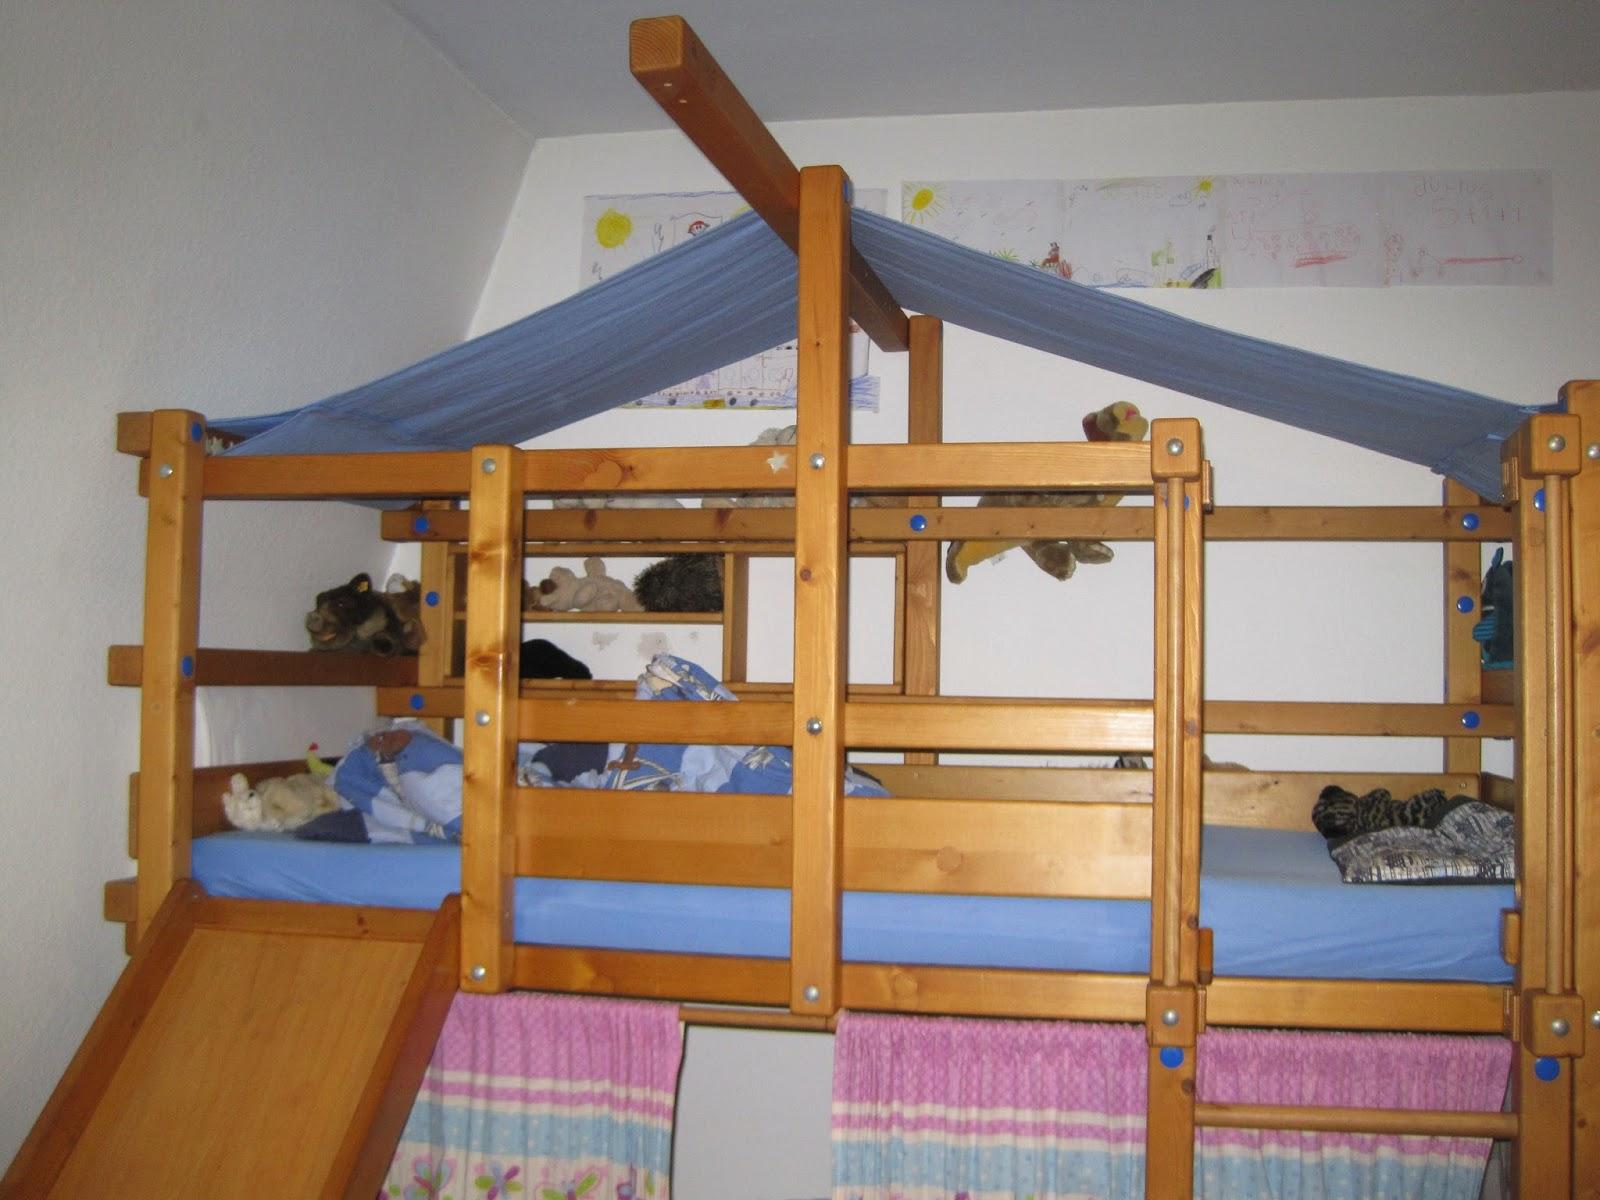 Etagenbetten Billi Bolli : Fadenland dach fürs billi bolli hochbett